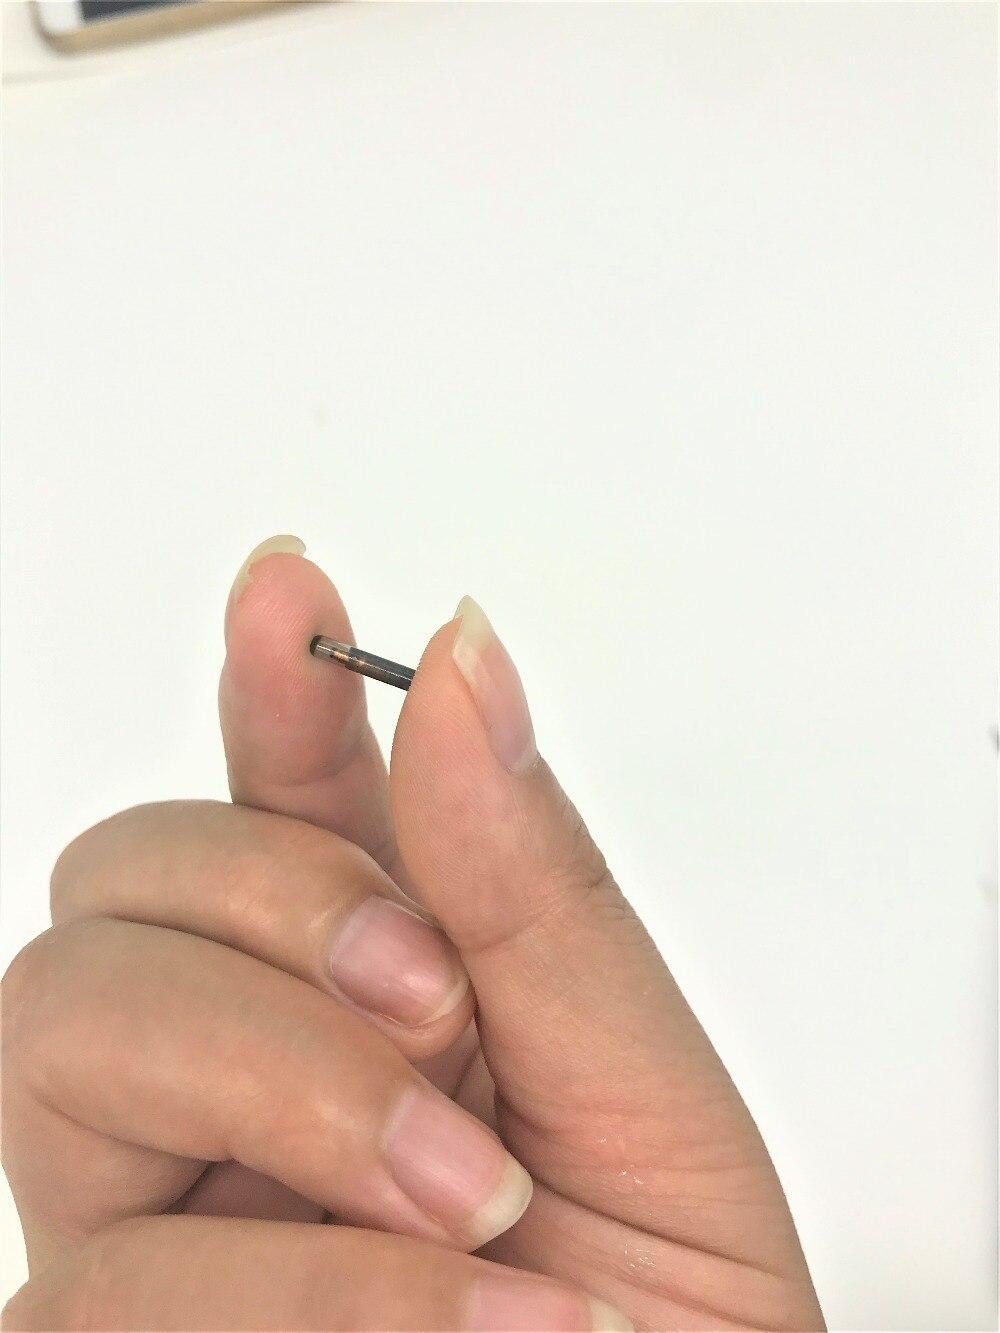 10pcs/lot 1.25*7 MM FDX-B Glass RFID Animal Microchip 134.2KHz Animal Glass Tag Implanted Rfid Animal Microchip